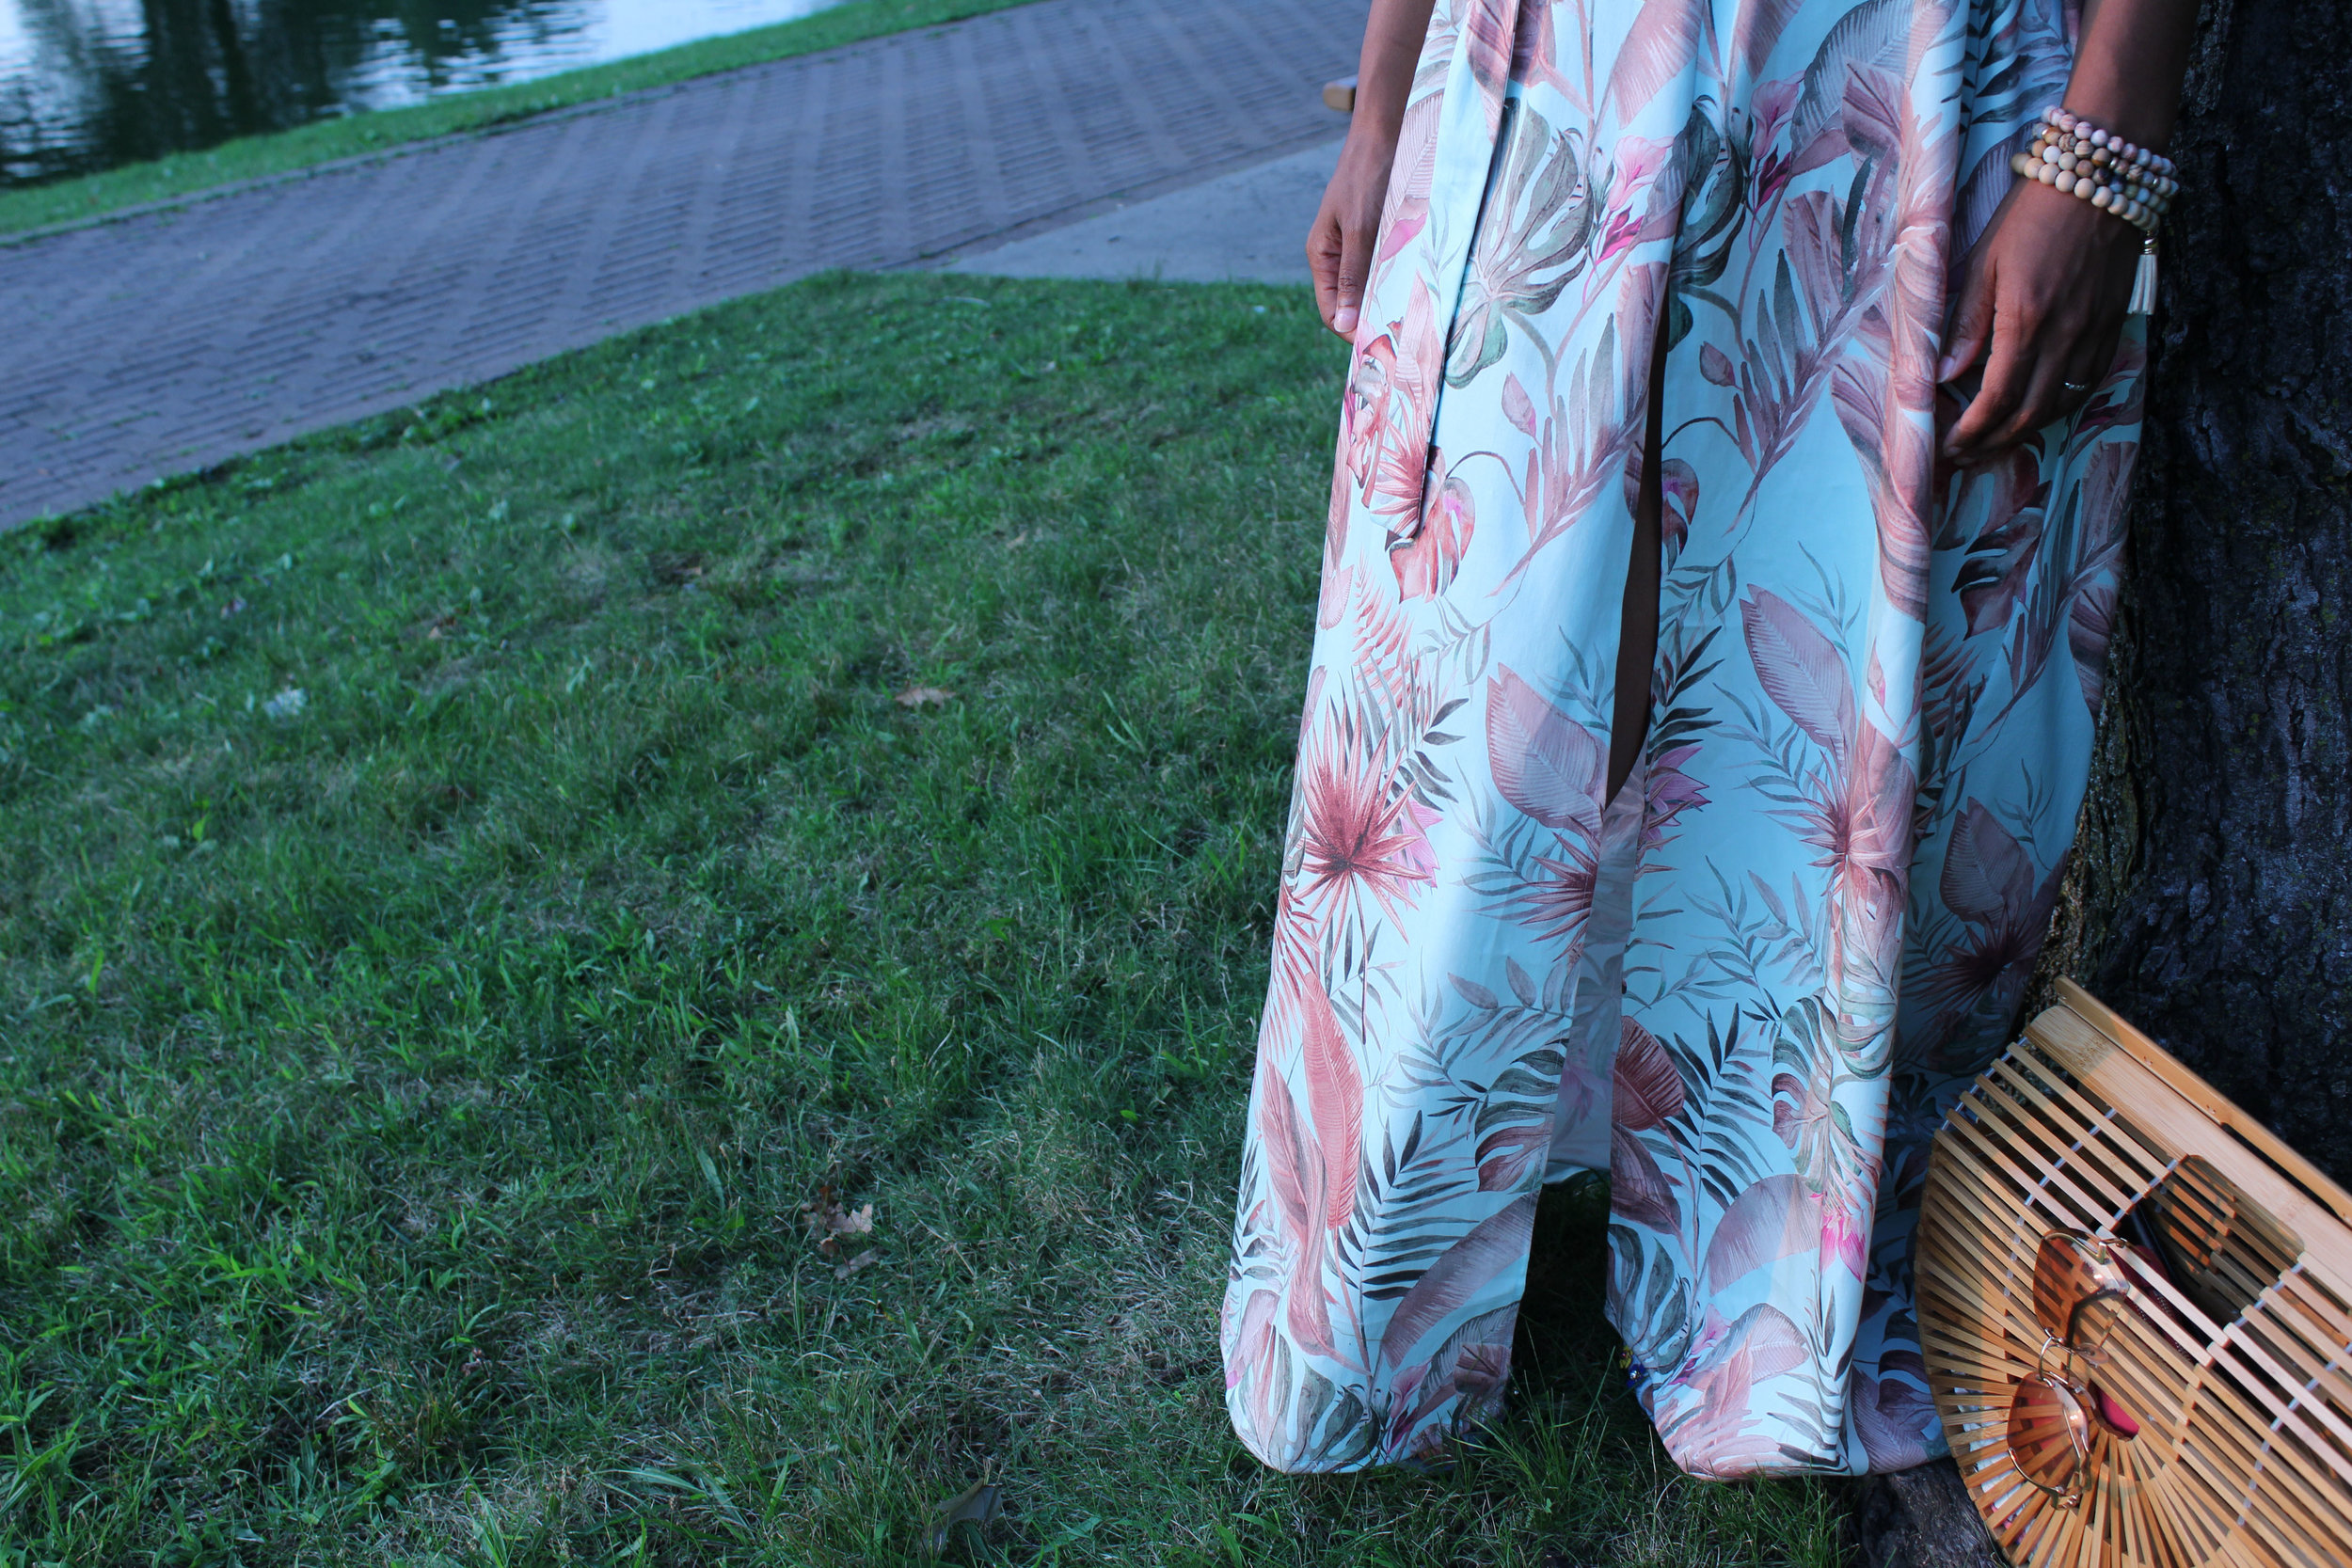 dresscloseup.jpg